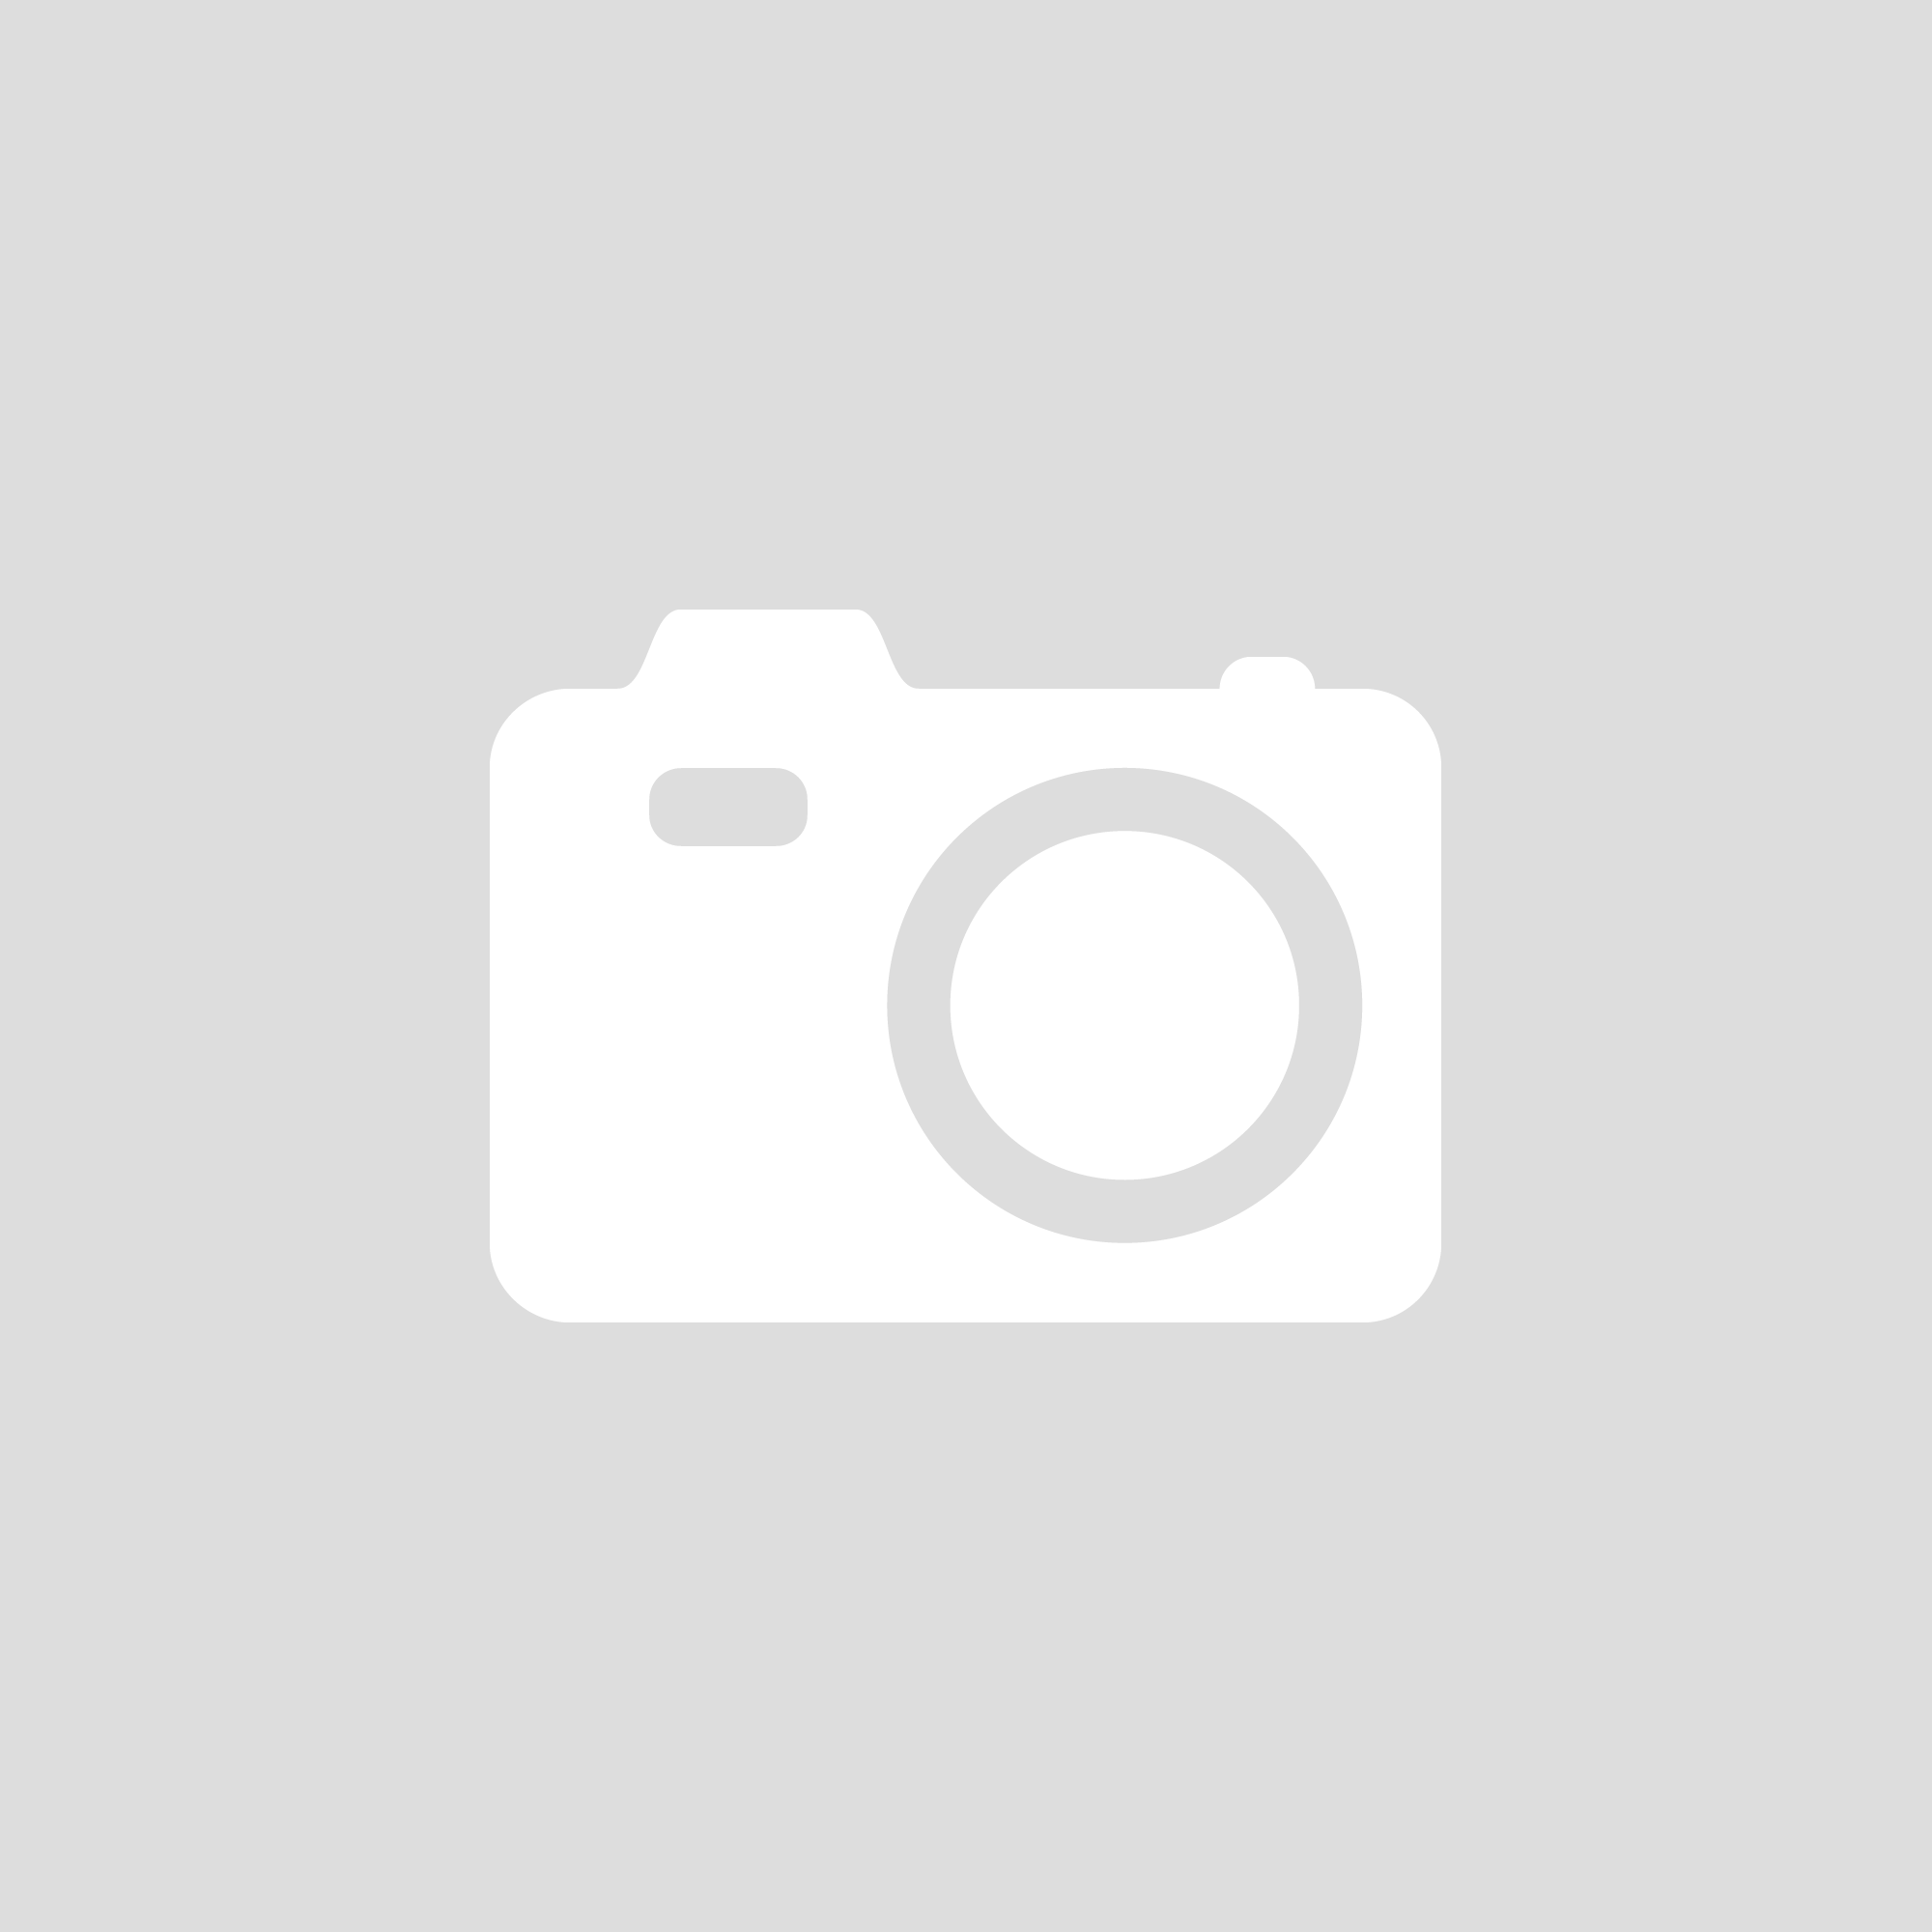 Regency Emblem Black / White Wallpaper from Seriano by Belgravia Decor GB 3551